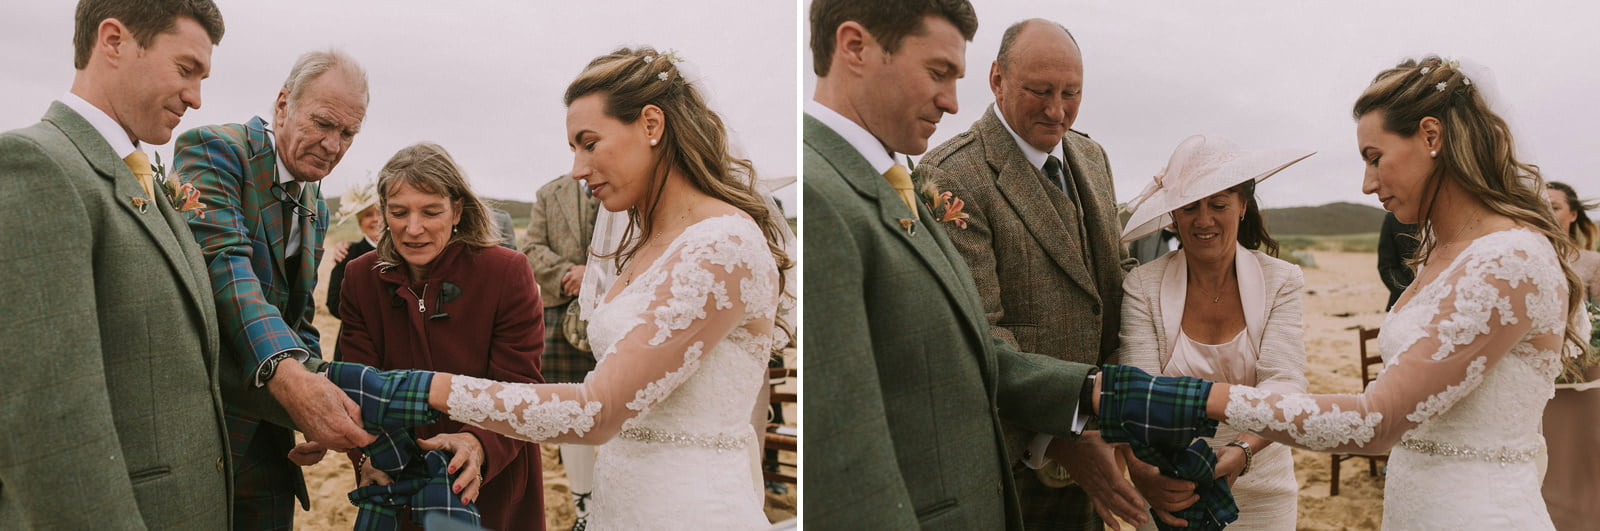 handfasting isle of harris wedding